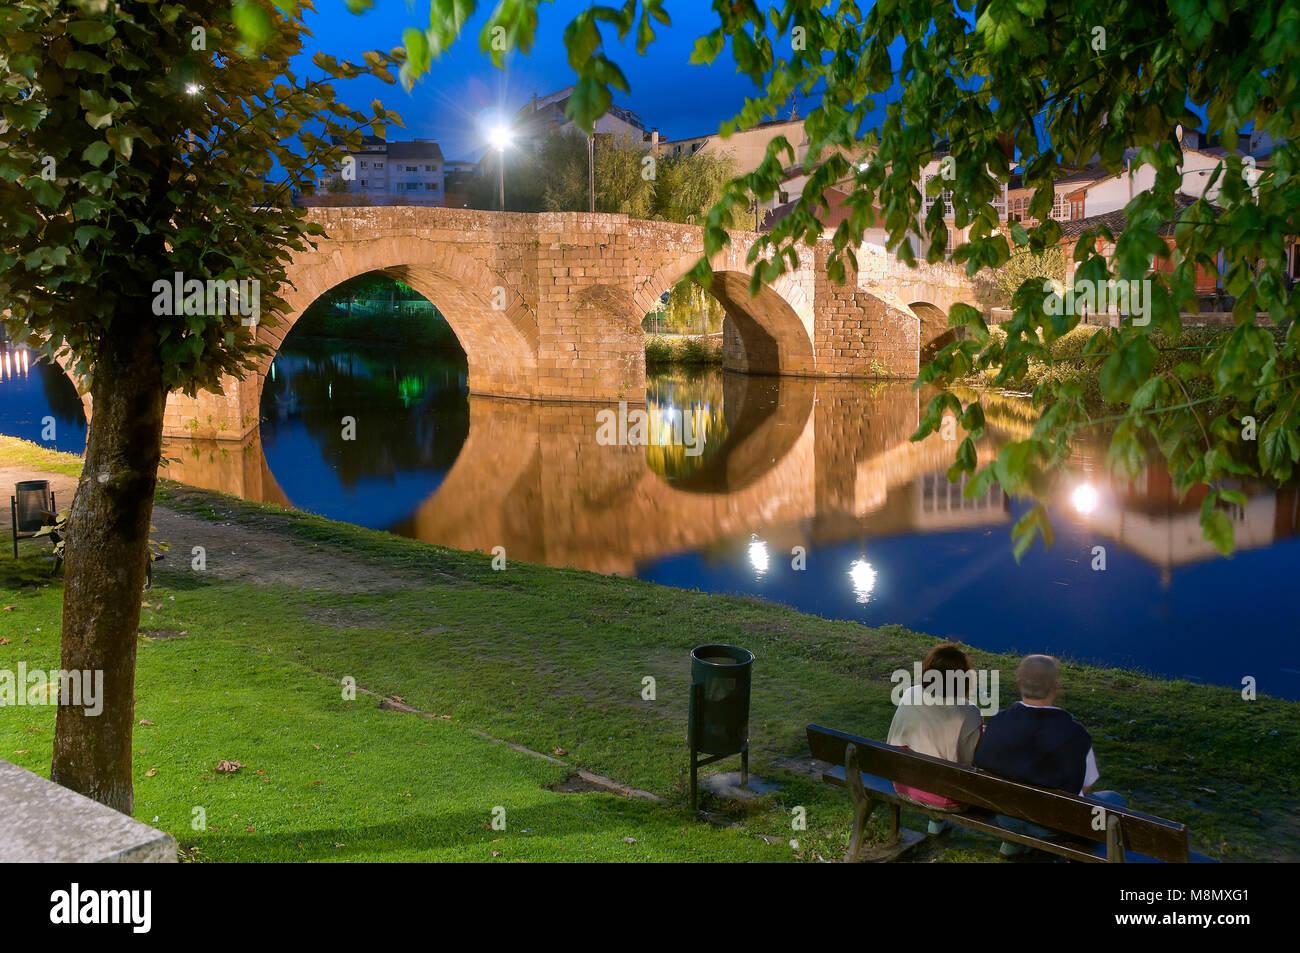 Cabe river and Ponte Vella at night, Monforte de Lemos, Lugo province, Region of Galicia, Spain, Europe - Stock Image